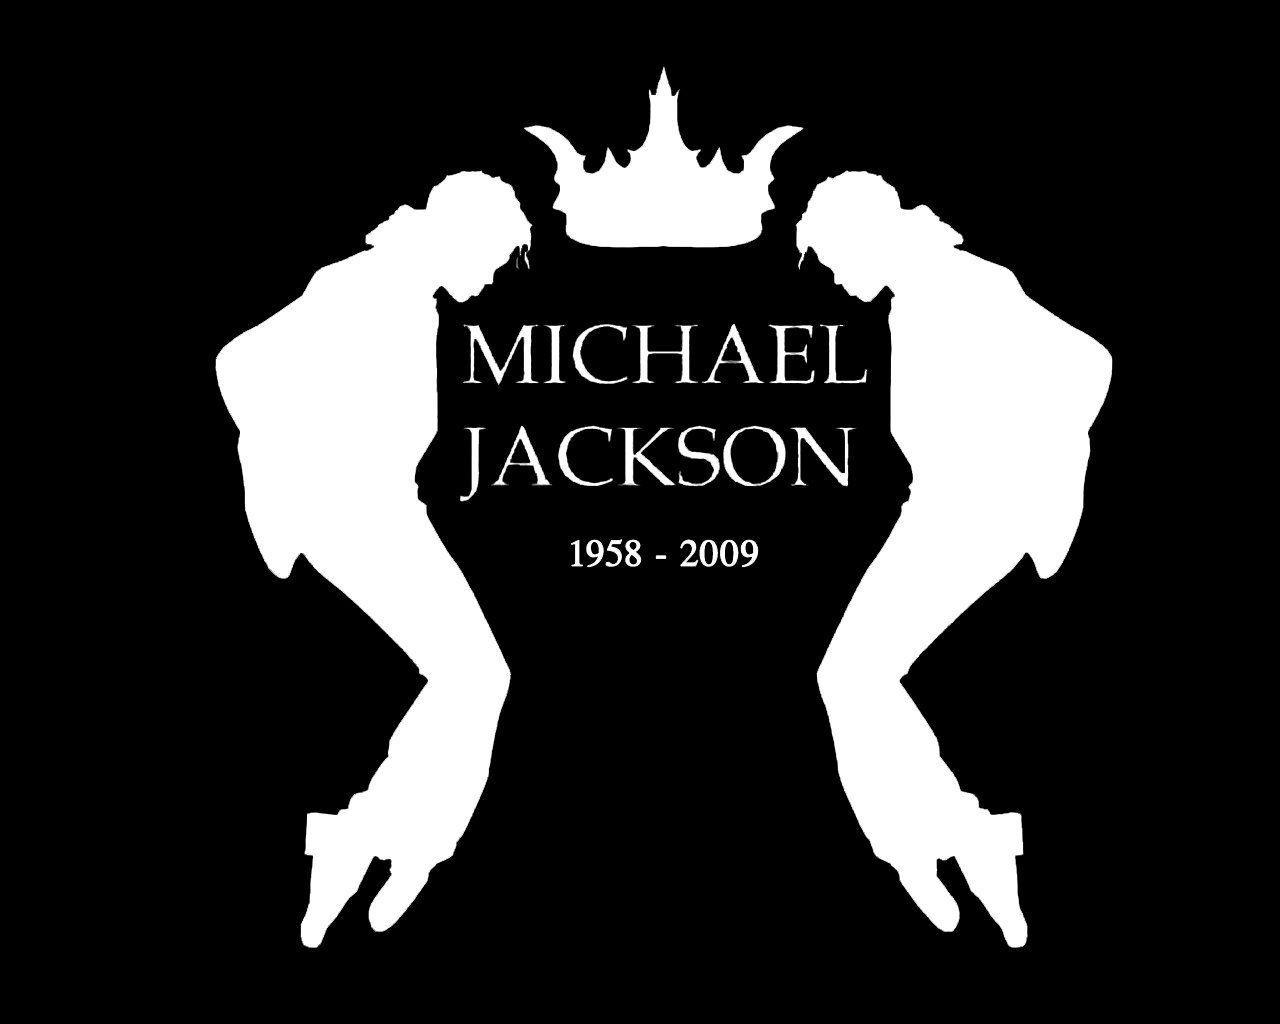 Michael Jackson Black And White Logo Logodix